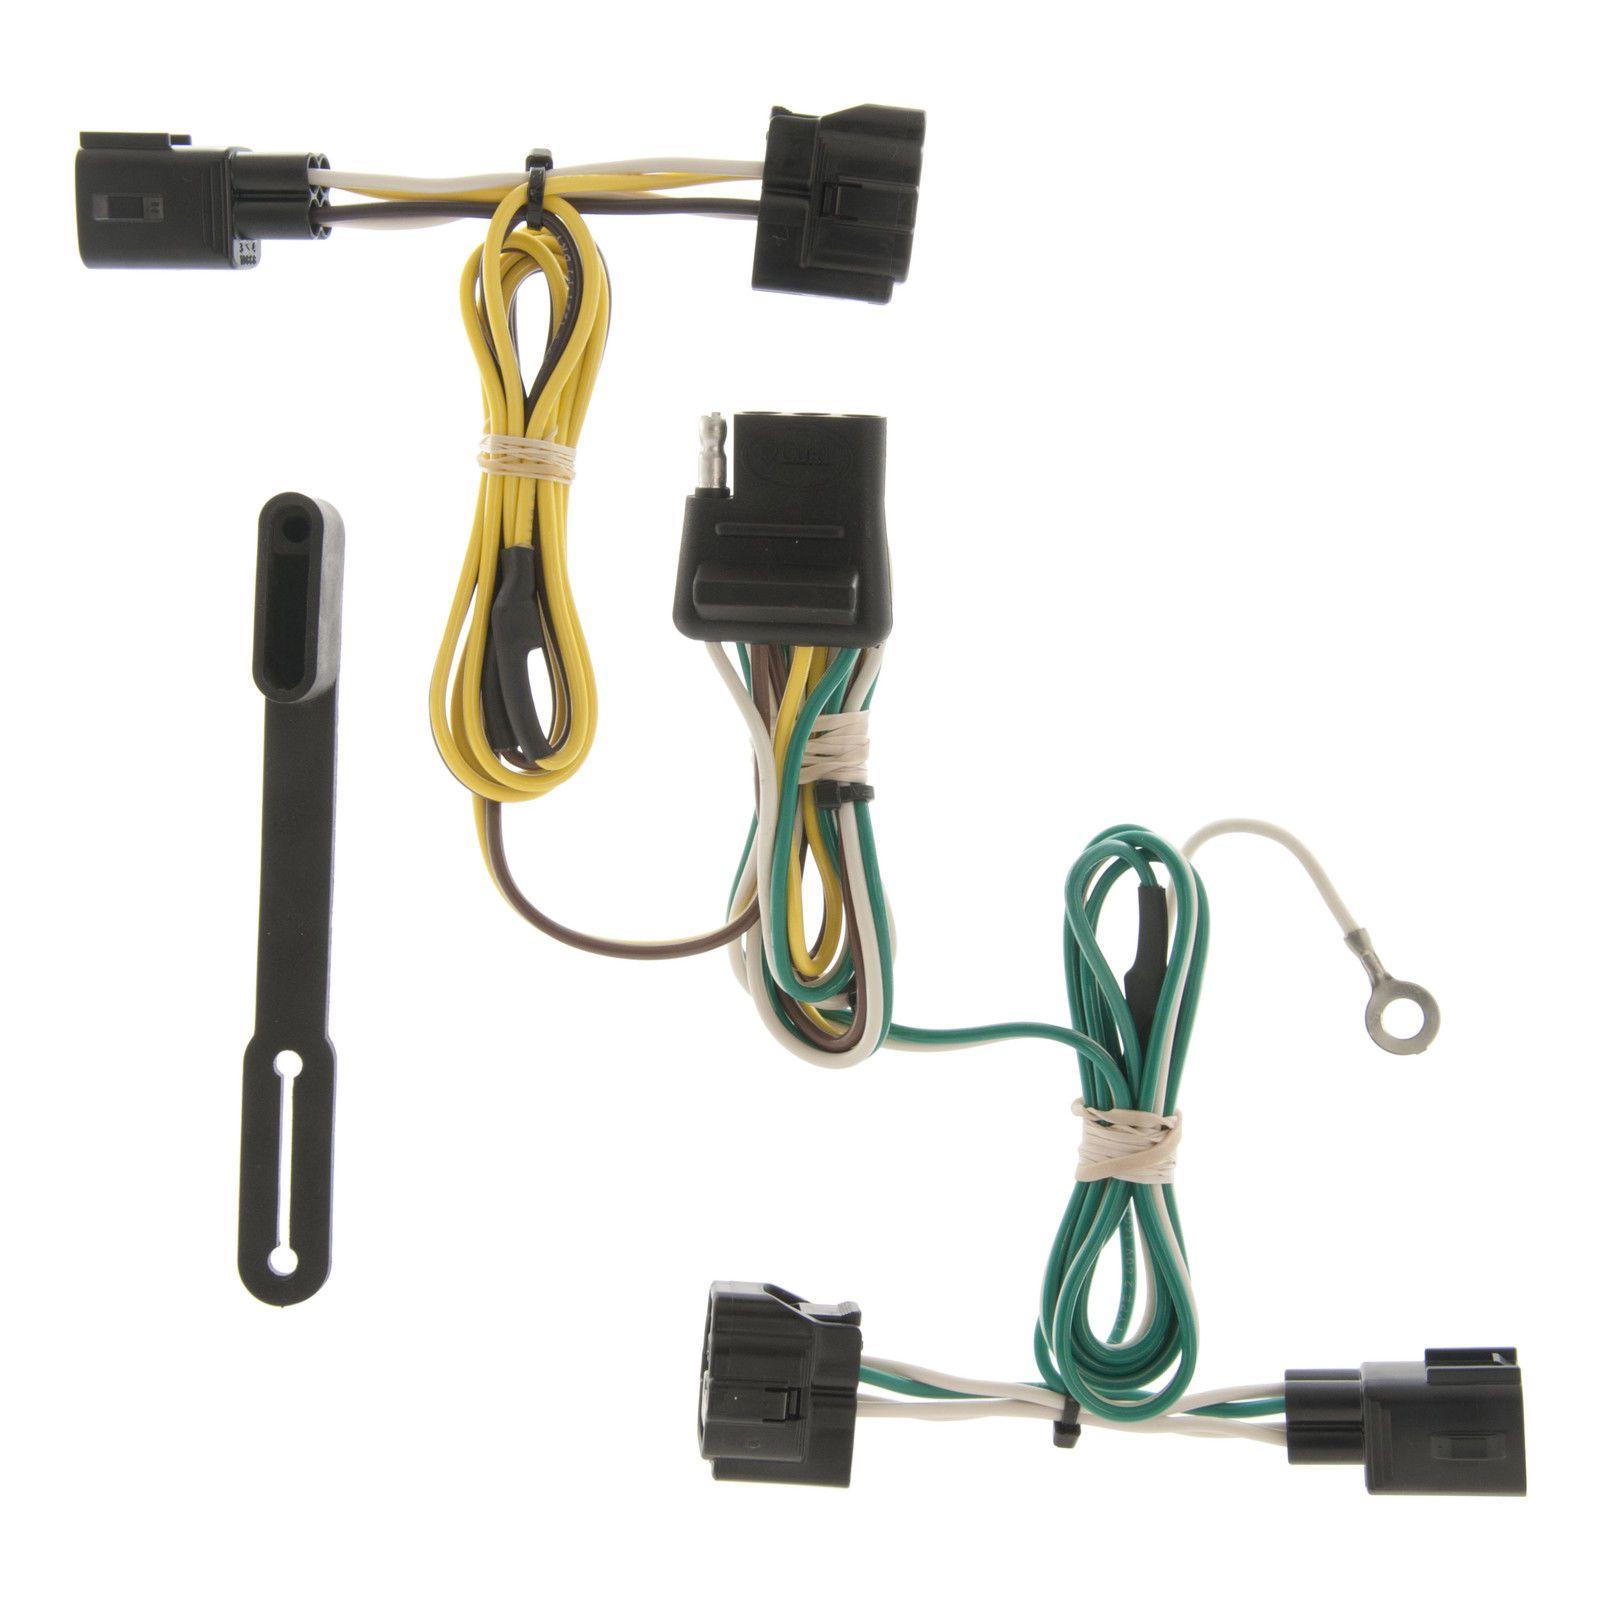 2006 jeep wrangler trailer wiring harness [ 1600 x 1600 Pixel ]